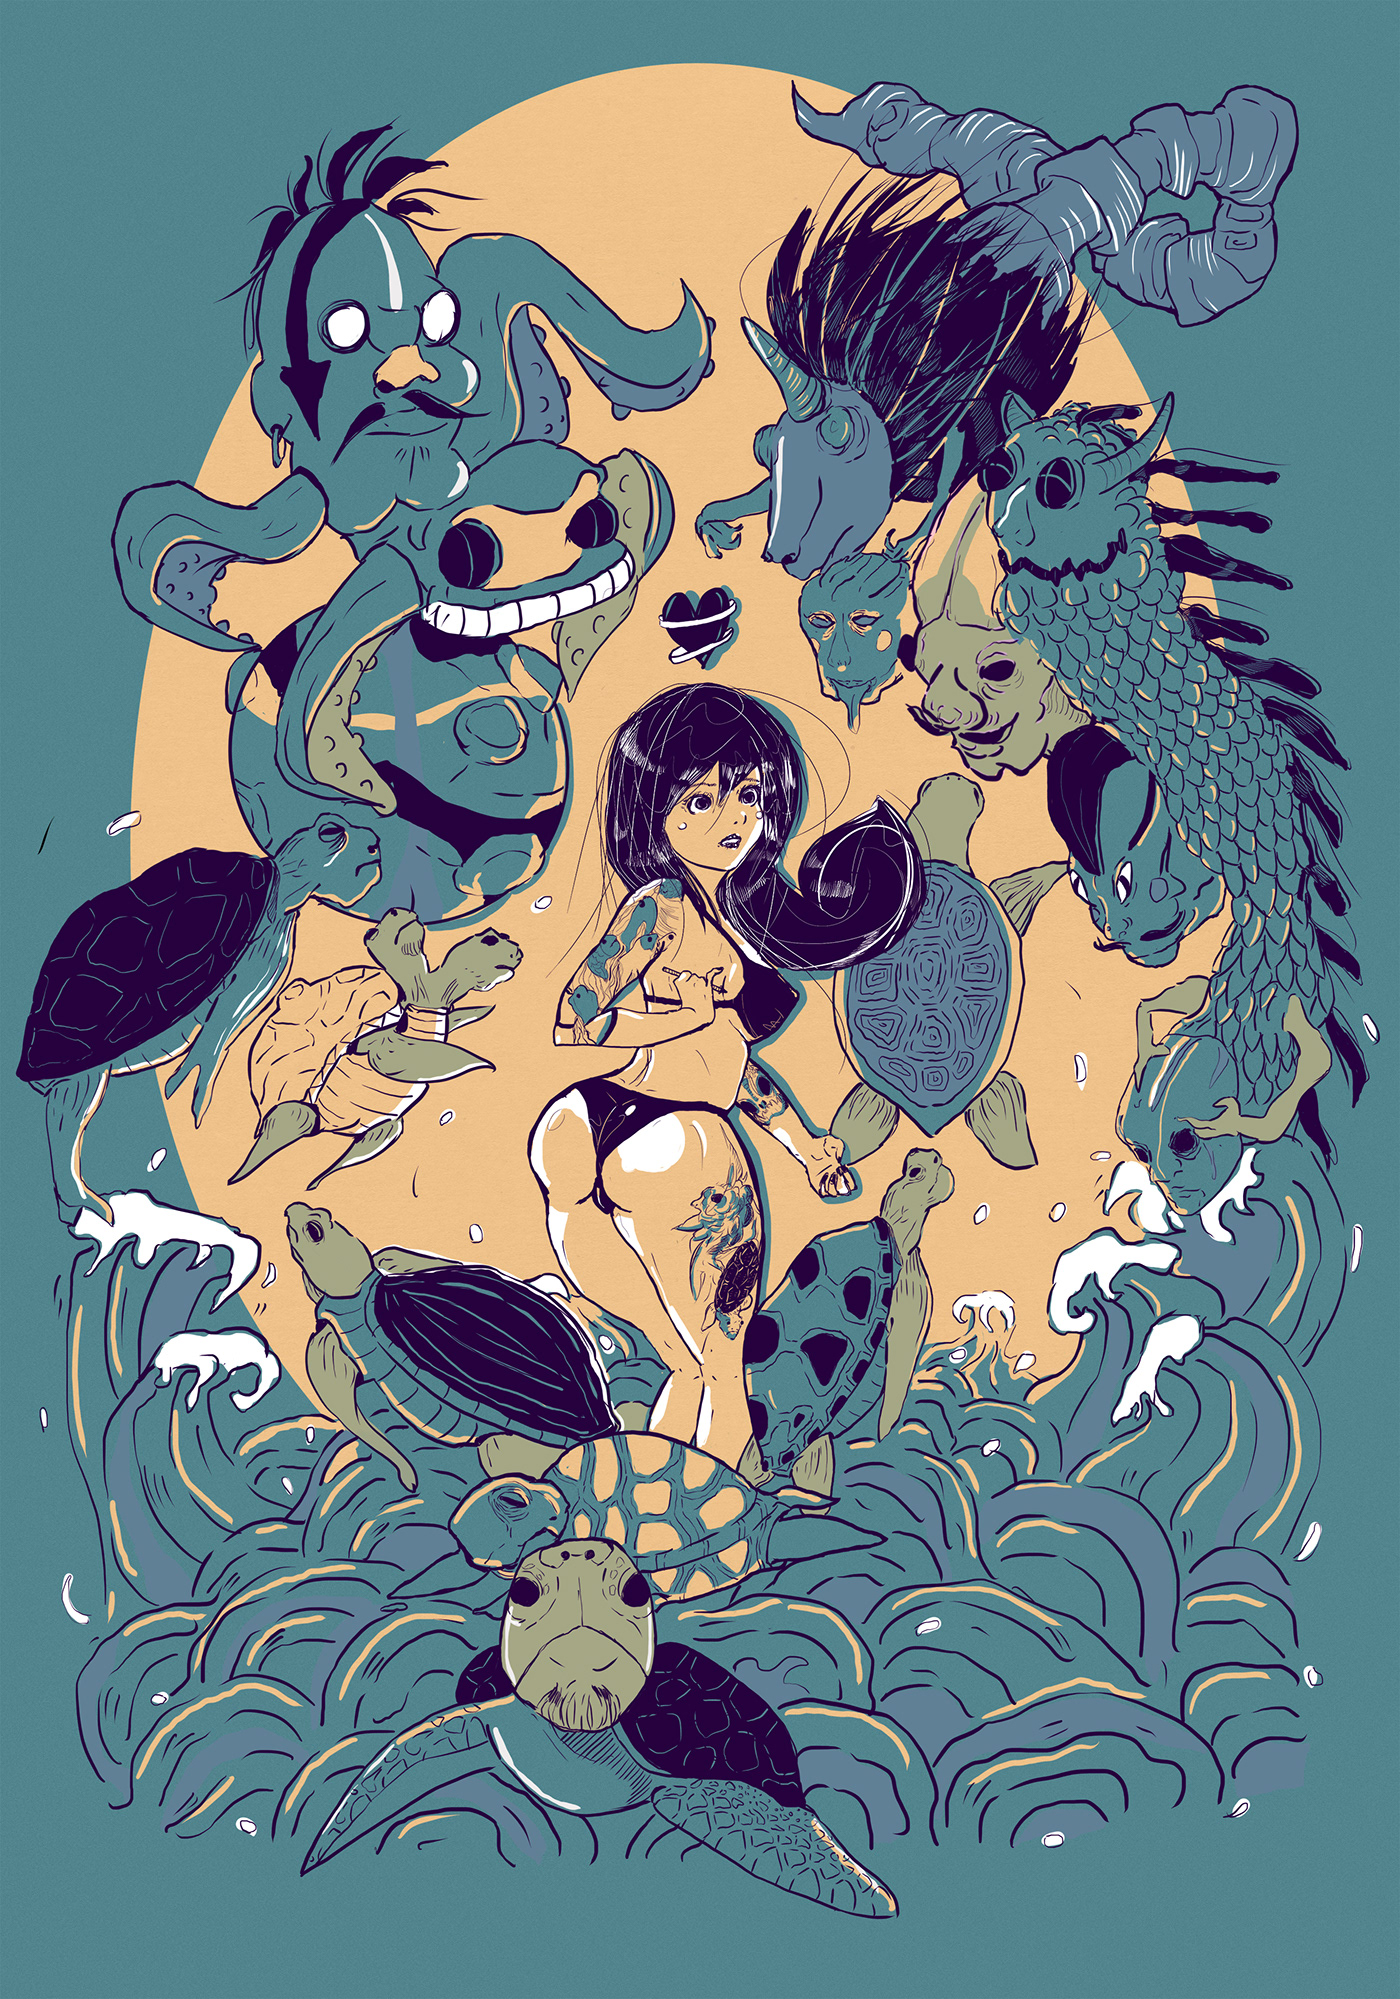 artist artwork cover digitalart DigitalIllustration magazine print Procreate